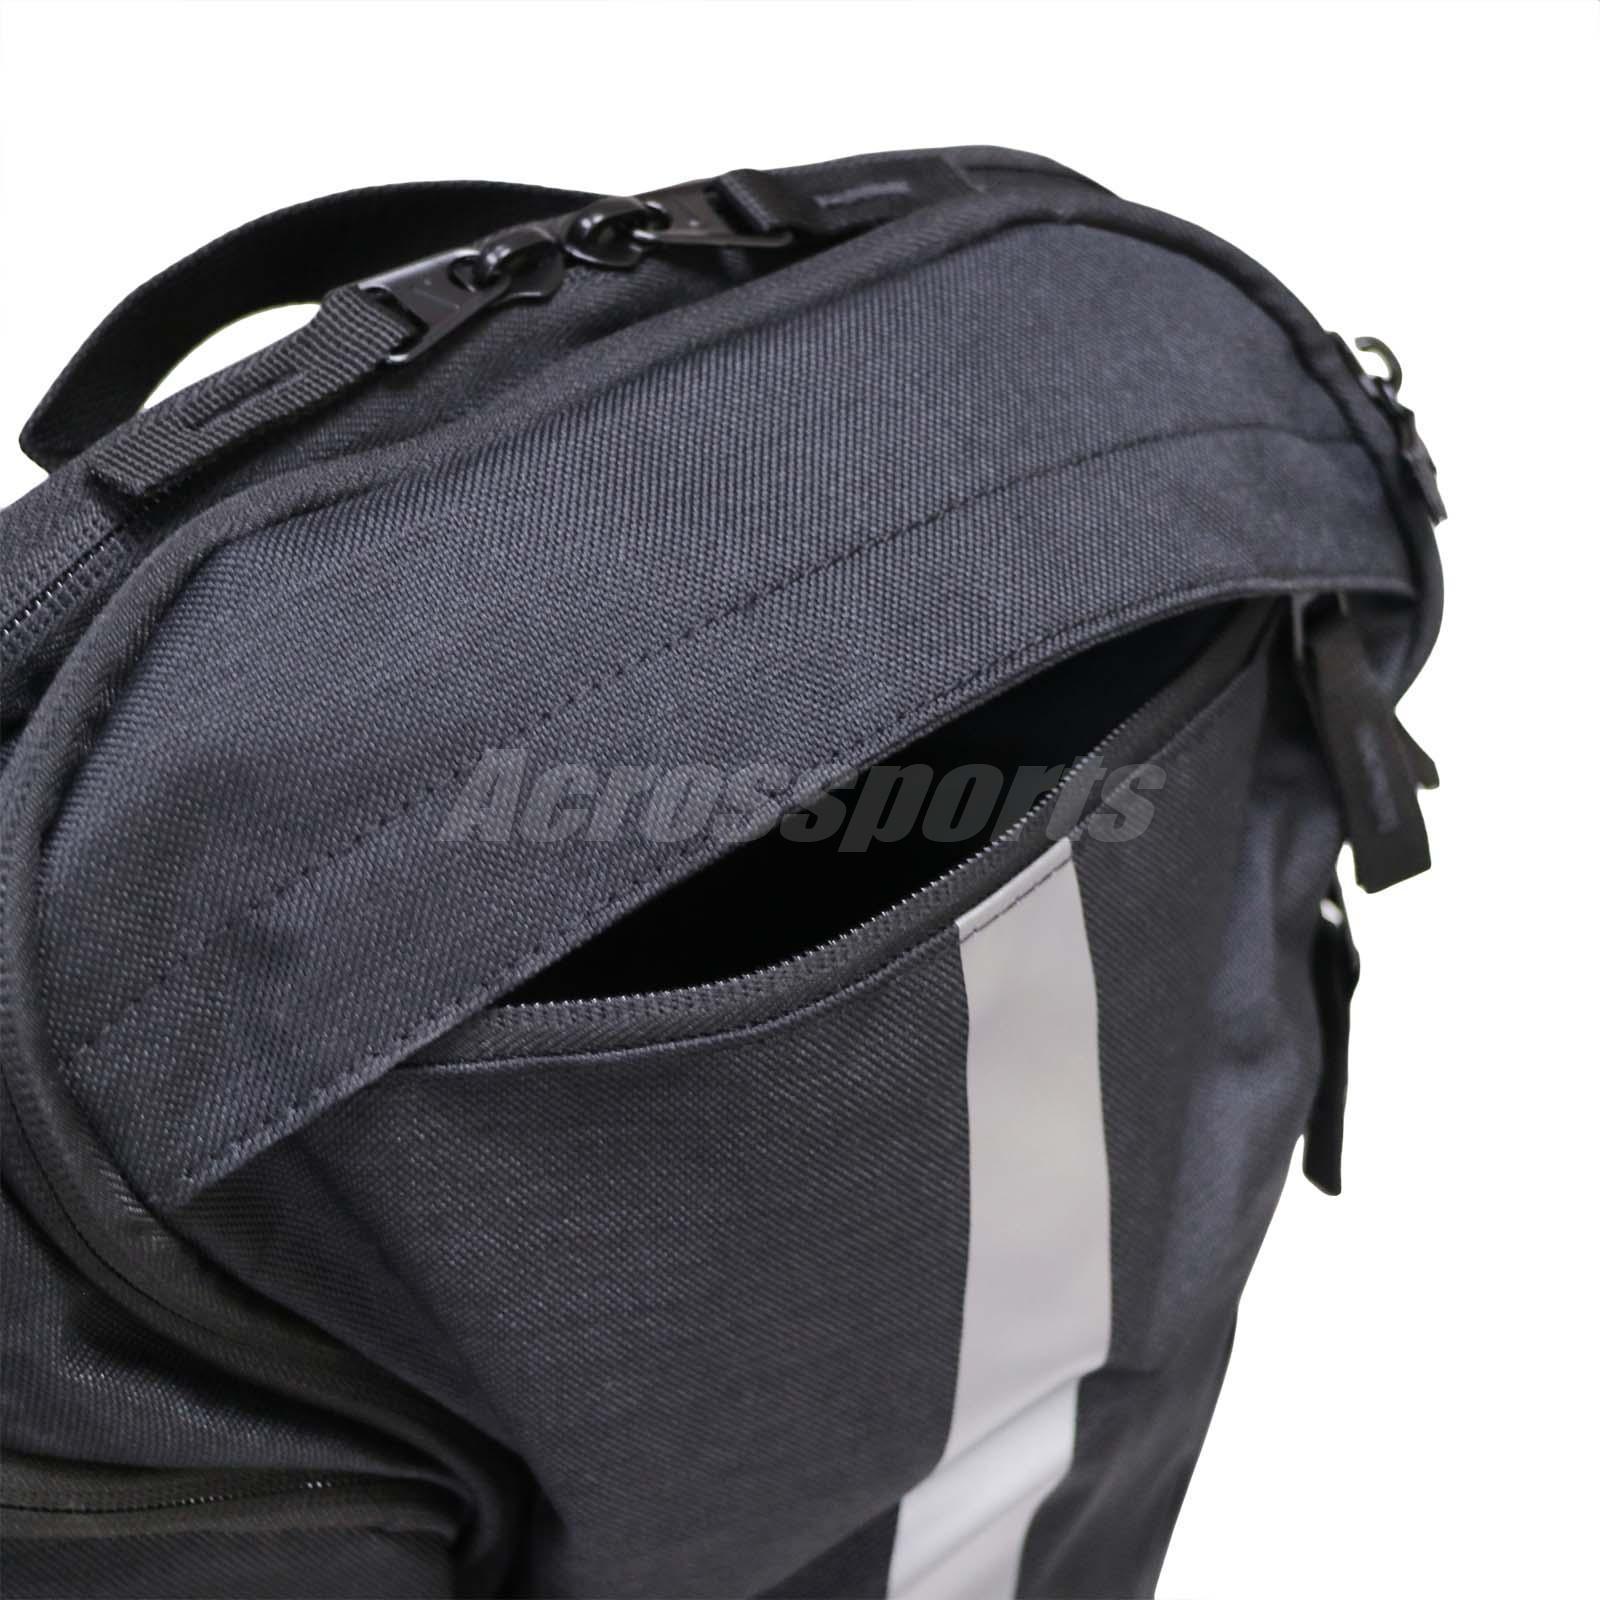 83f60cb4c243 Nike Hoops Elite Pro Basketball Backpack Training Sport Gym Bag ...